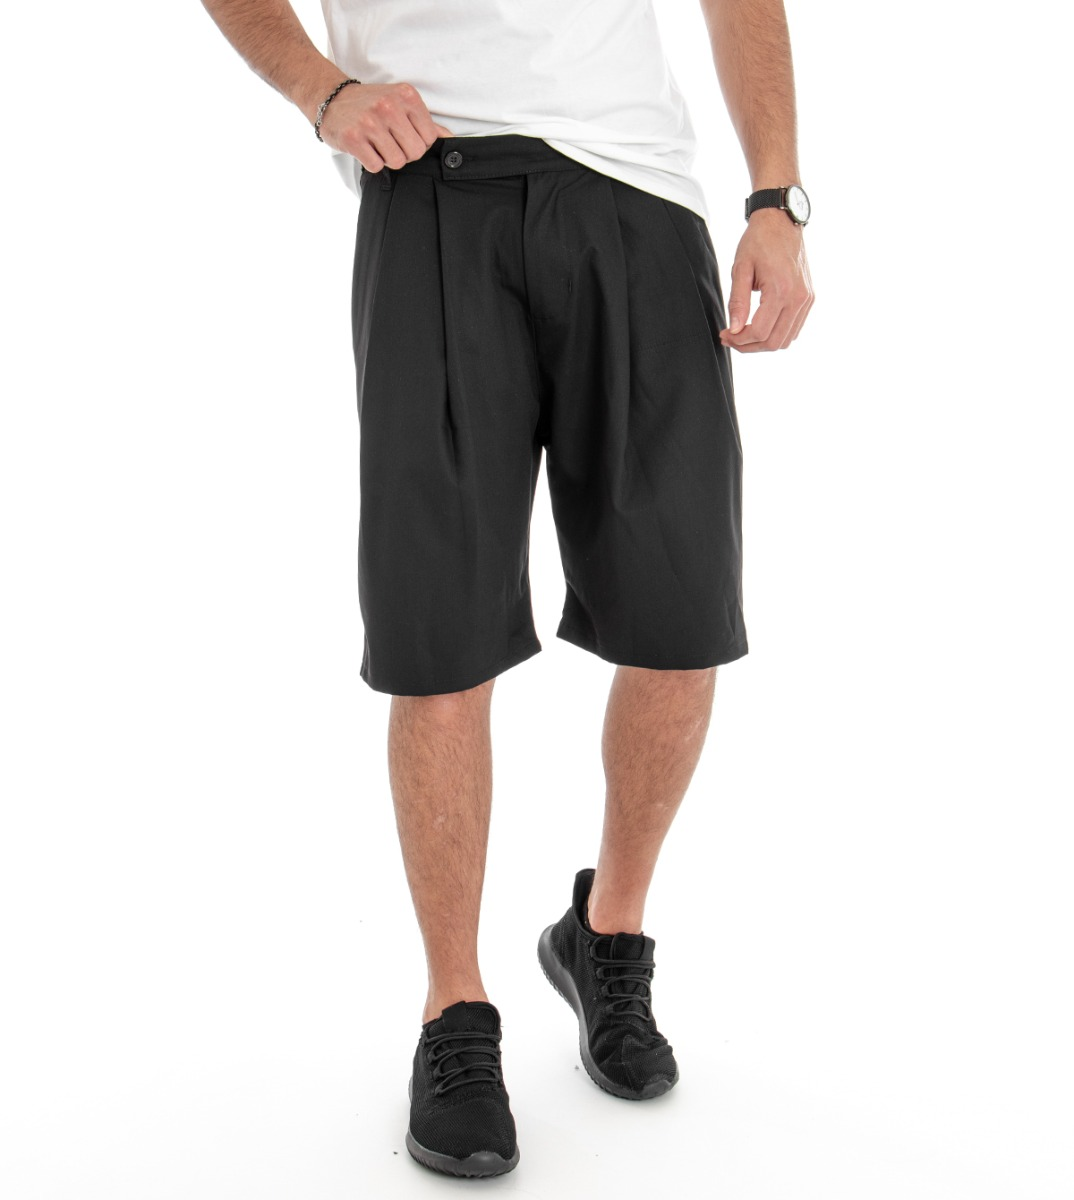 Bermuda Uomo Pantaloncini Pantalone Corto Fantasia Scozzese Grigio Casual GIOSAL